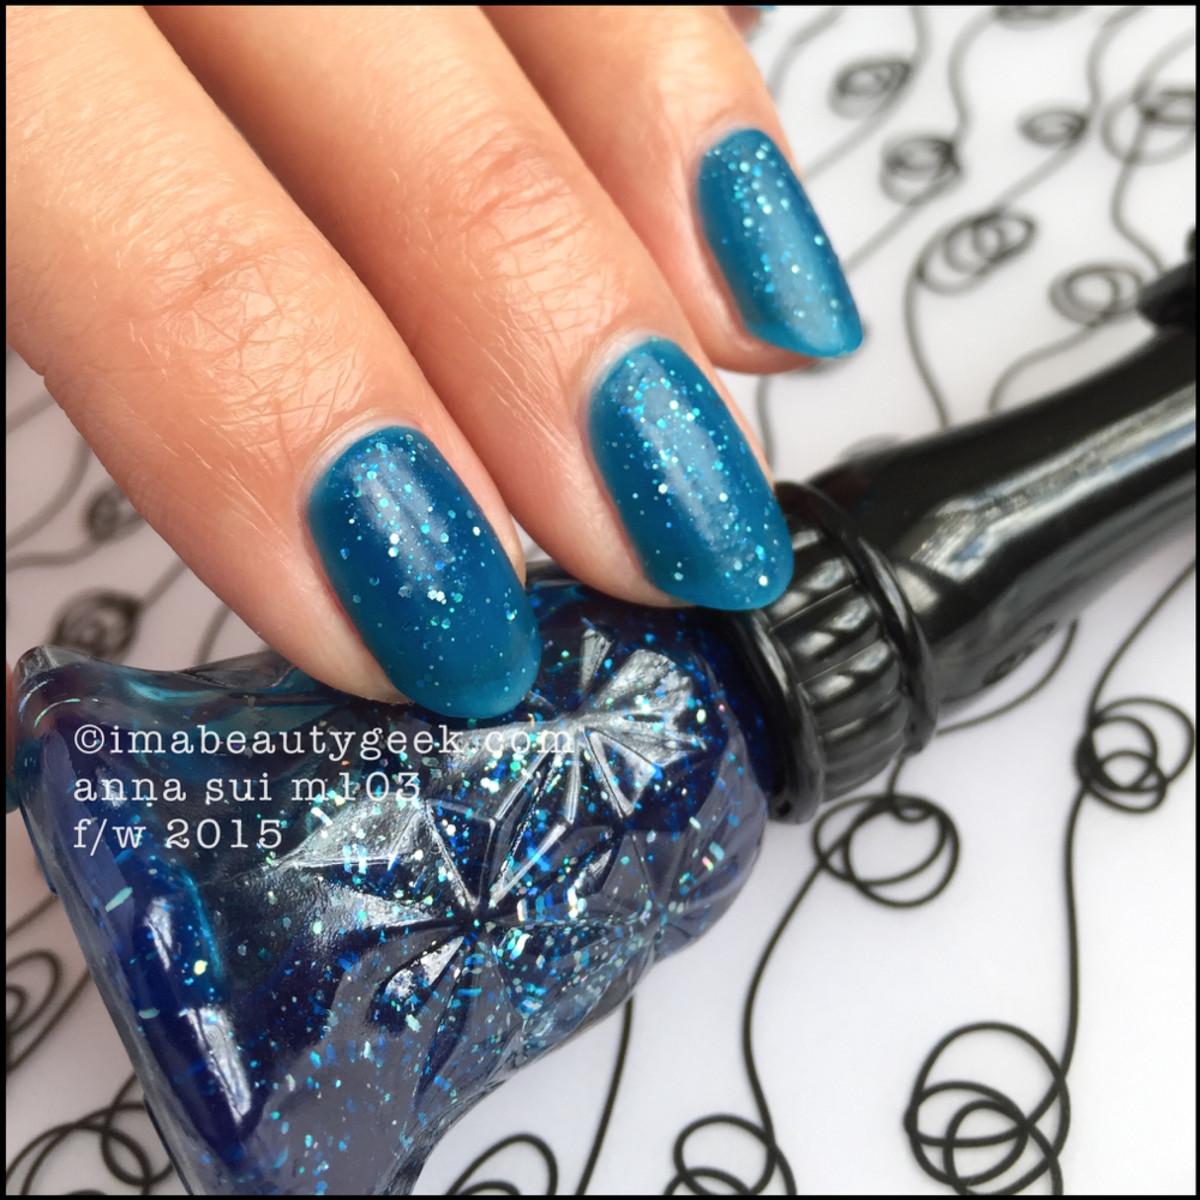 Anna Sui Nail Polish M103_Anna Sui Nail Color 2015